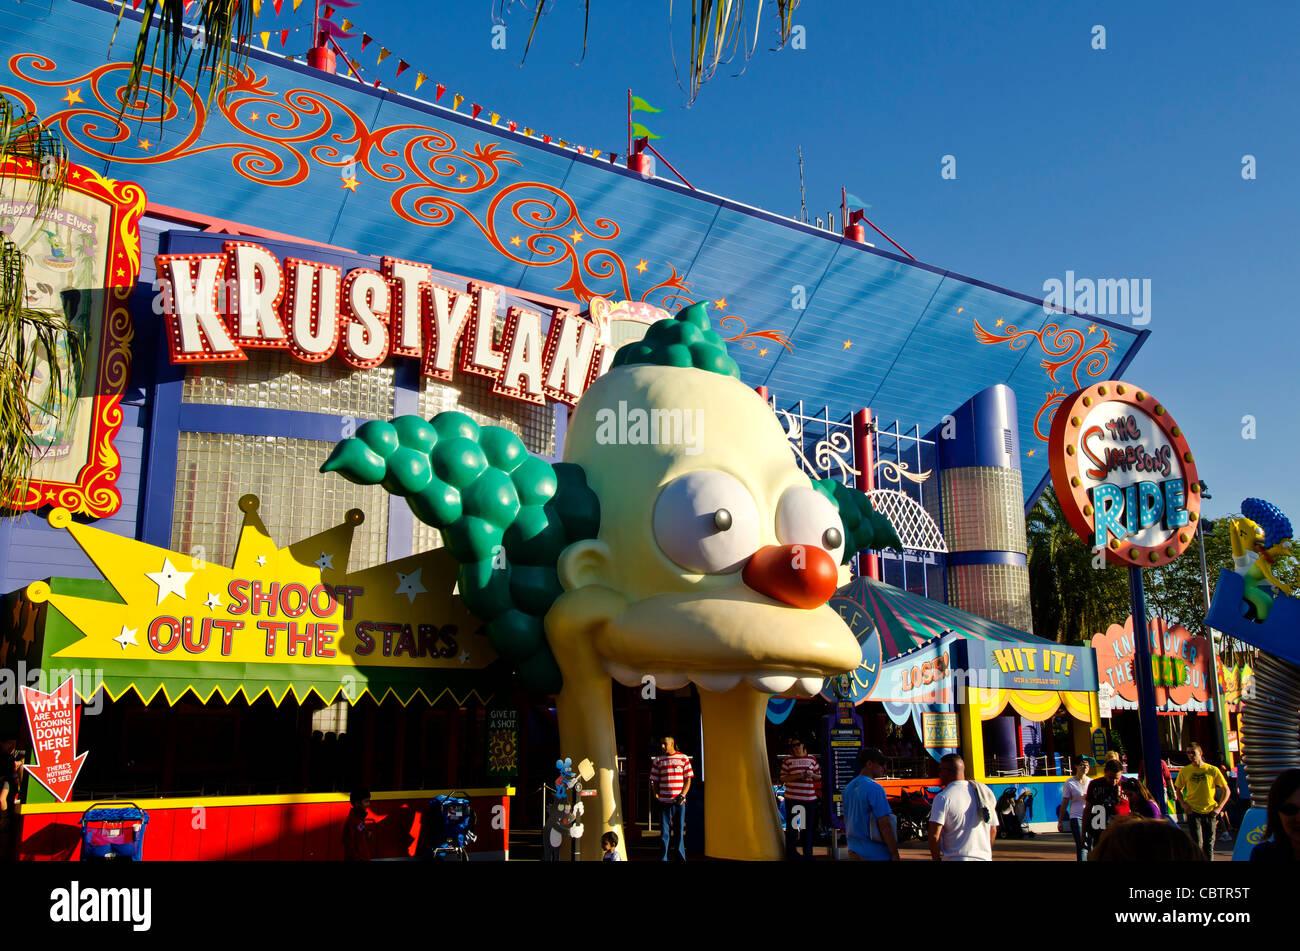 Krustyland The Simpson's Ride at Universal Studios Orlando, Florida - Stock Image